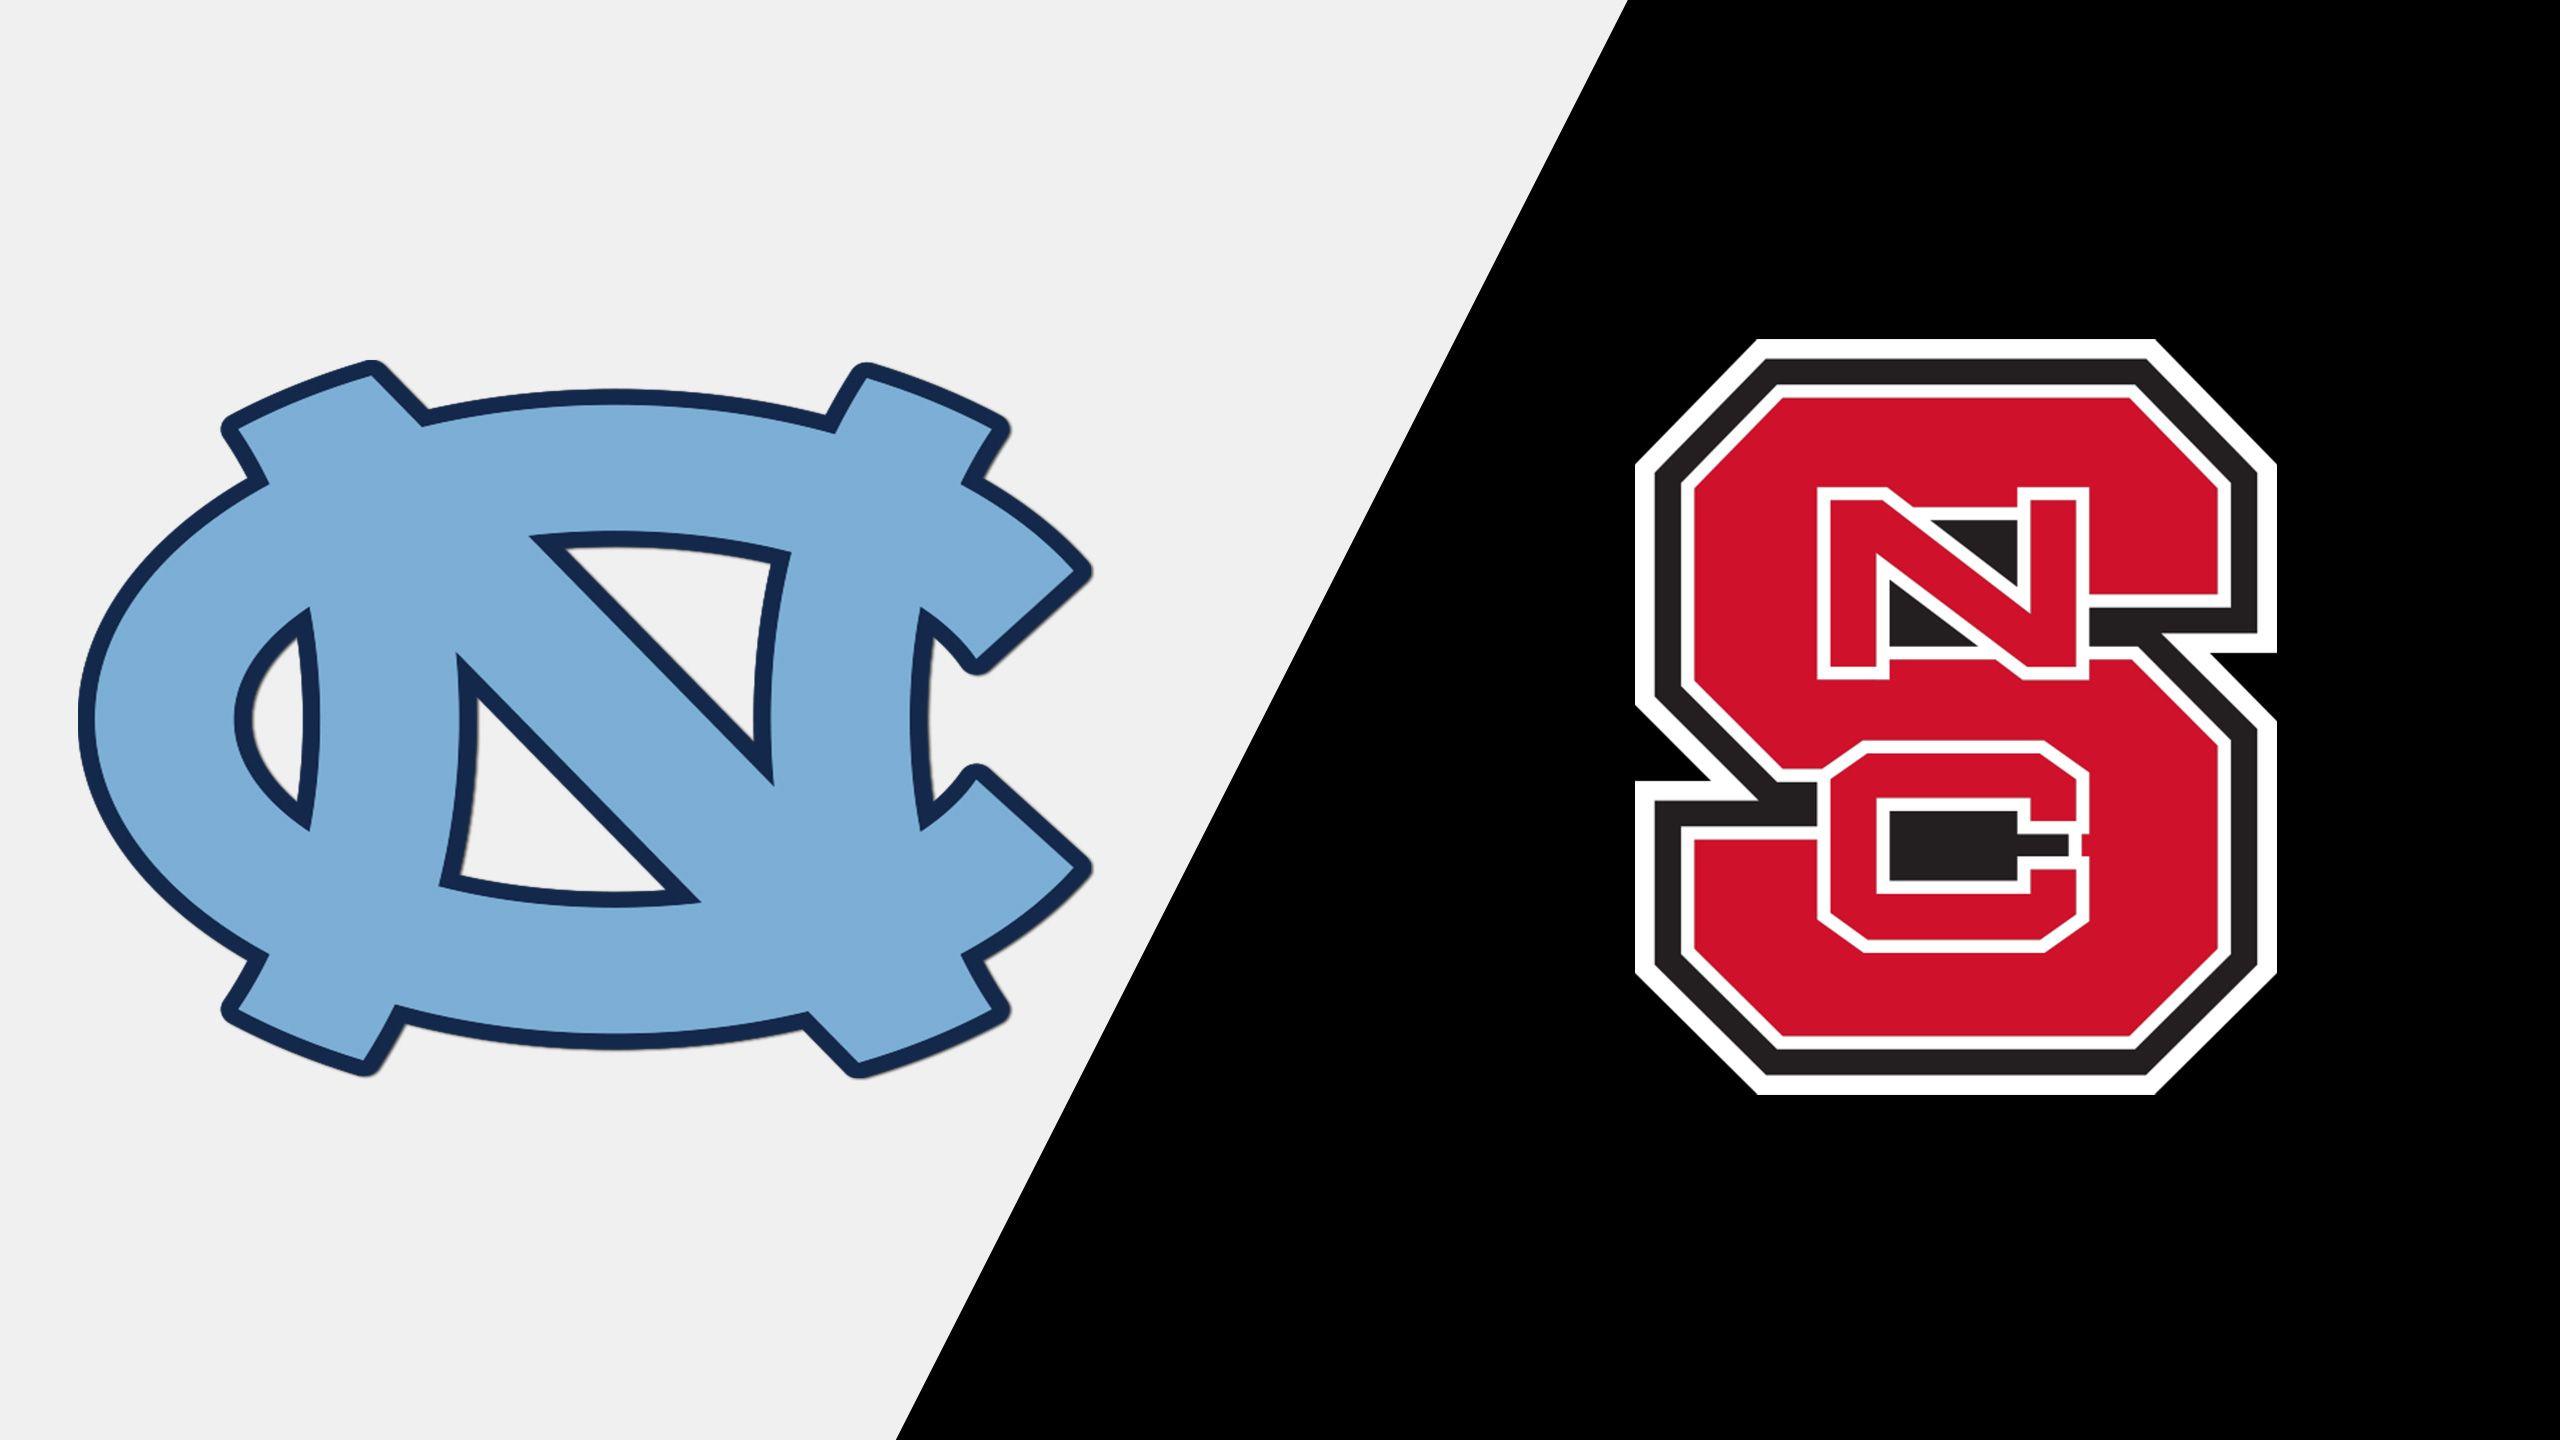 #12 North Carolina vs. #3 NC State (Baseball)